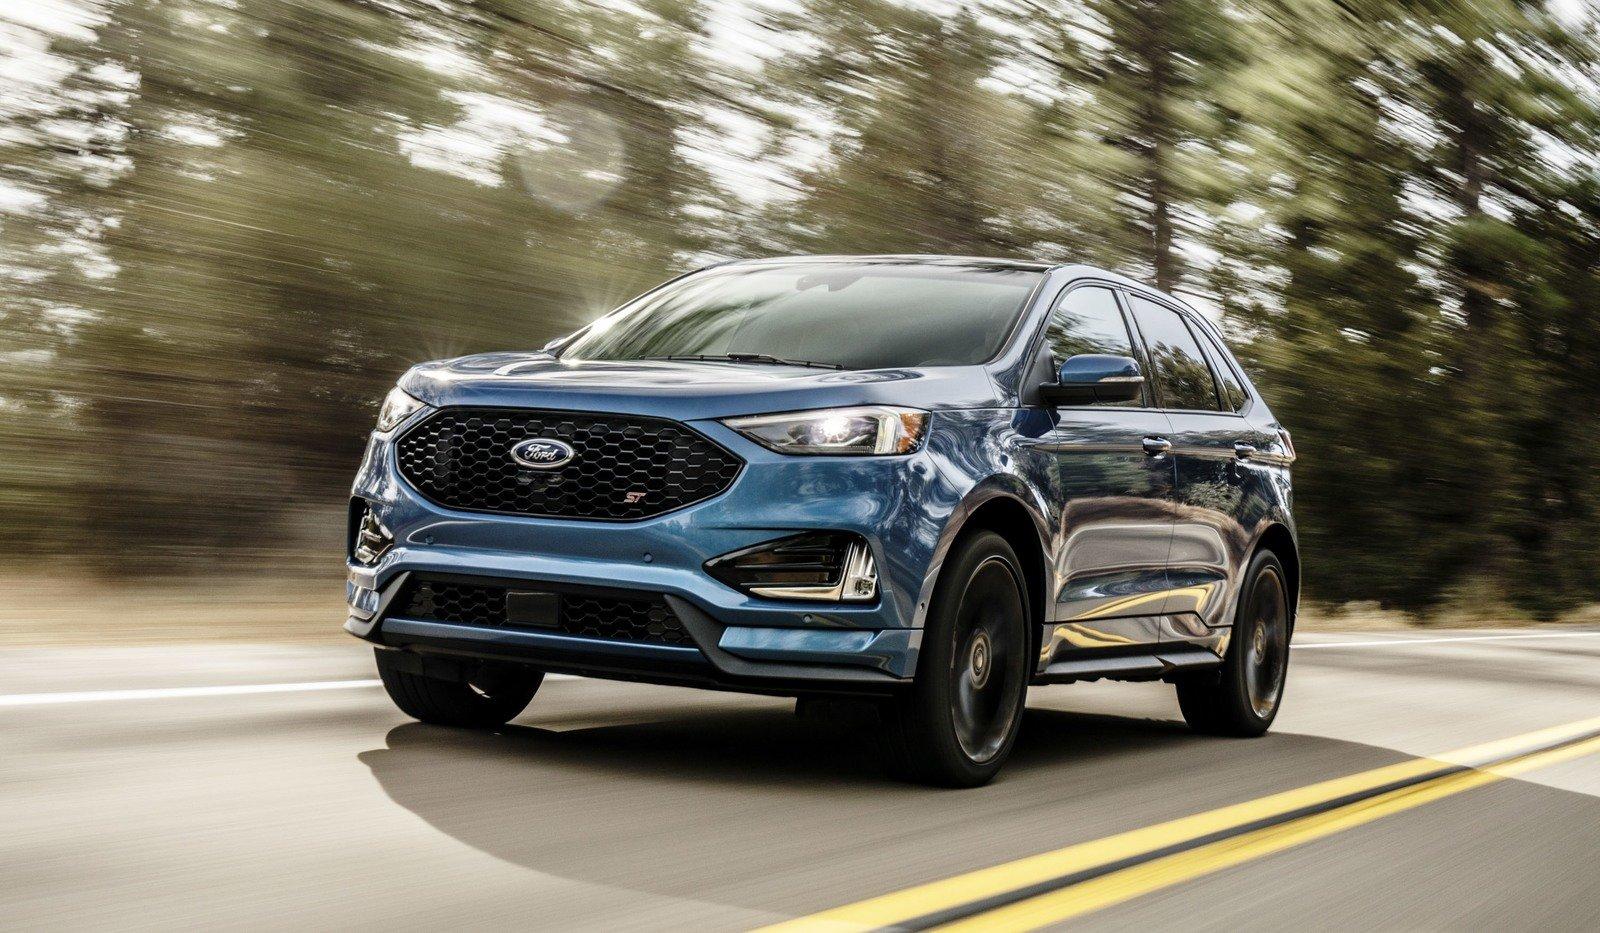 2019 Ford Edge Exterior